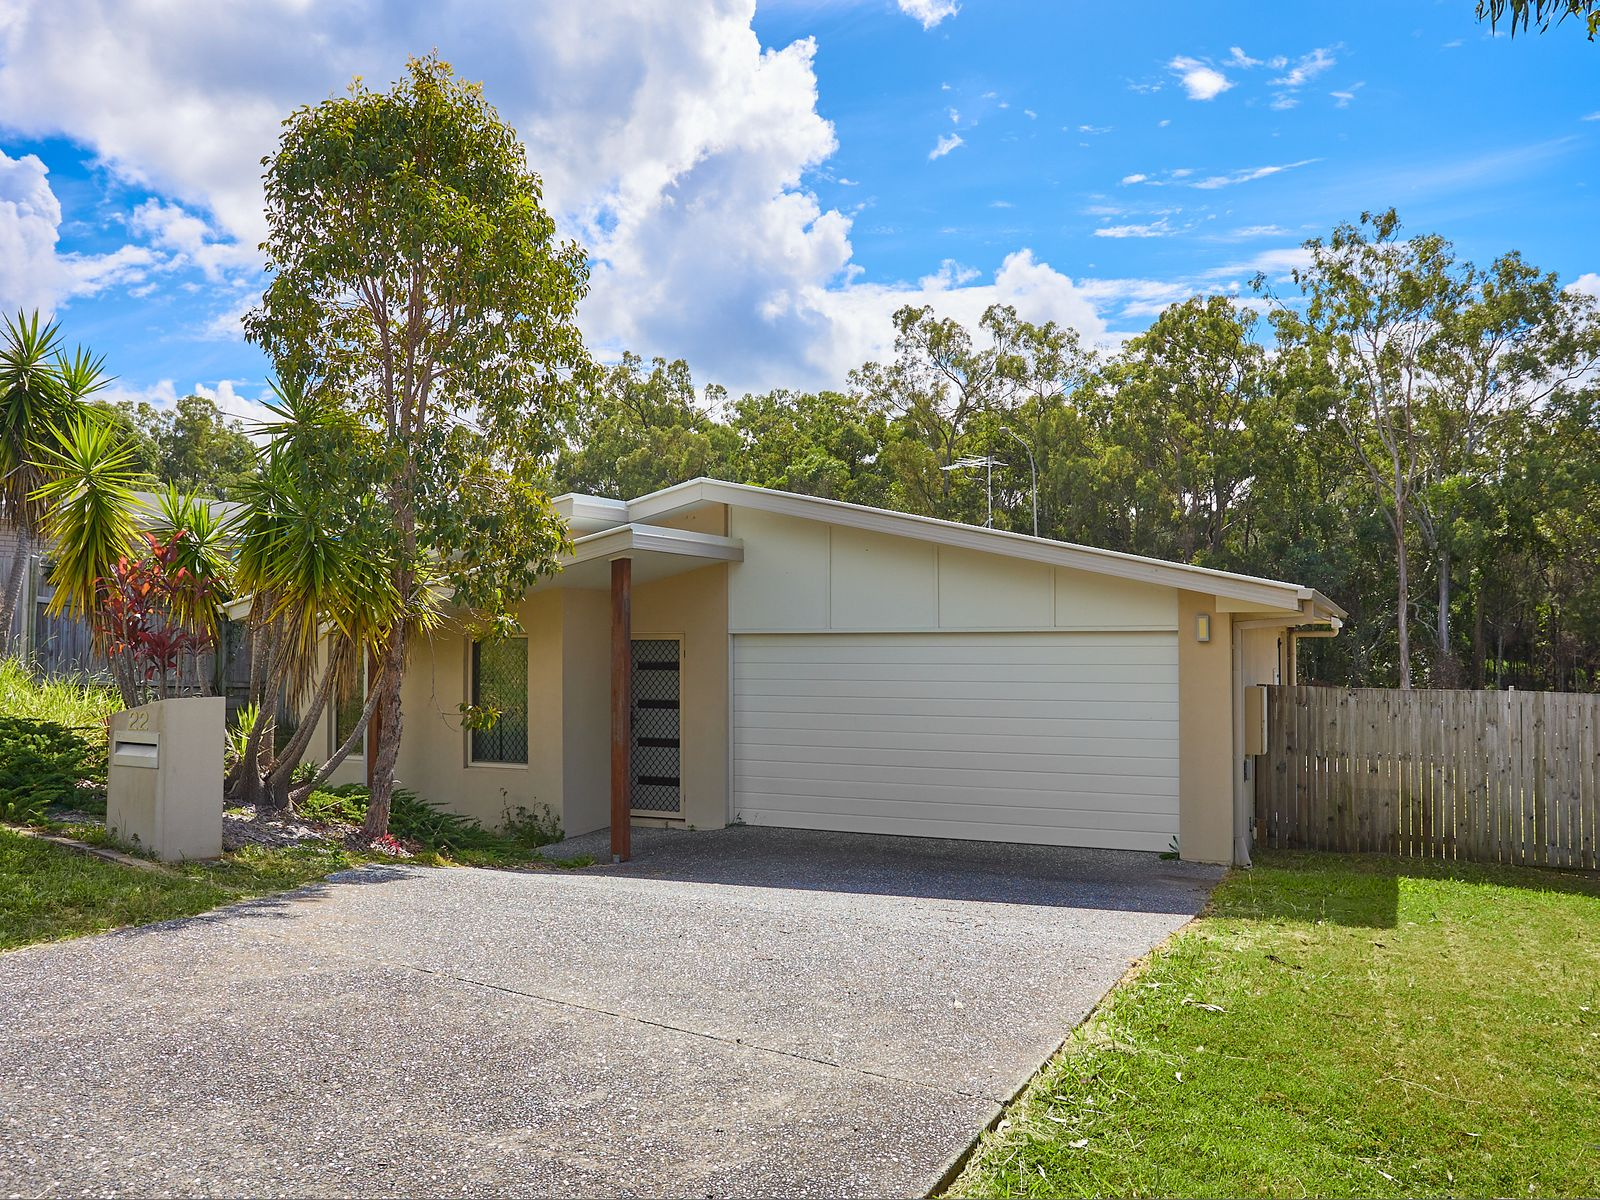 22 Hanover Drive, Pimpama, QLD 4209